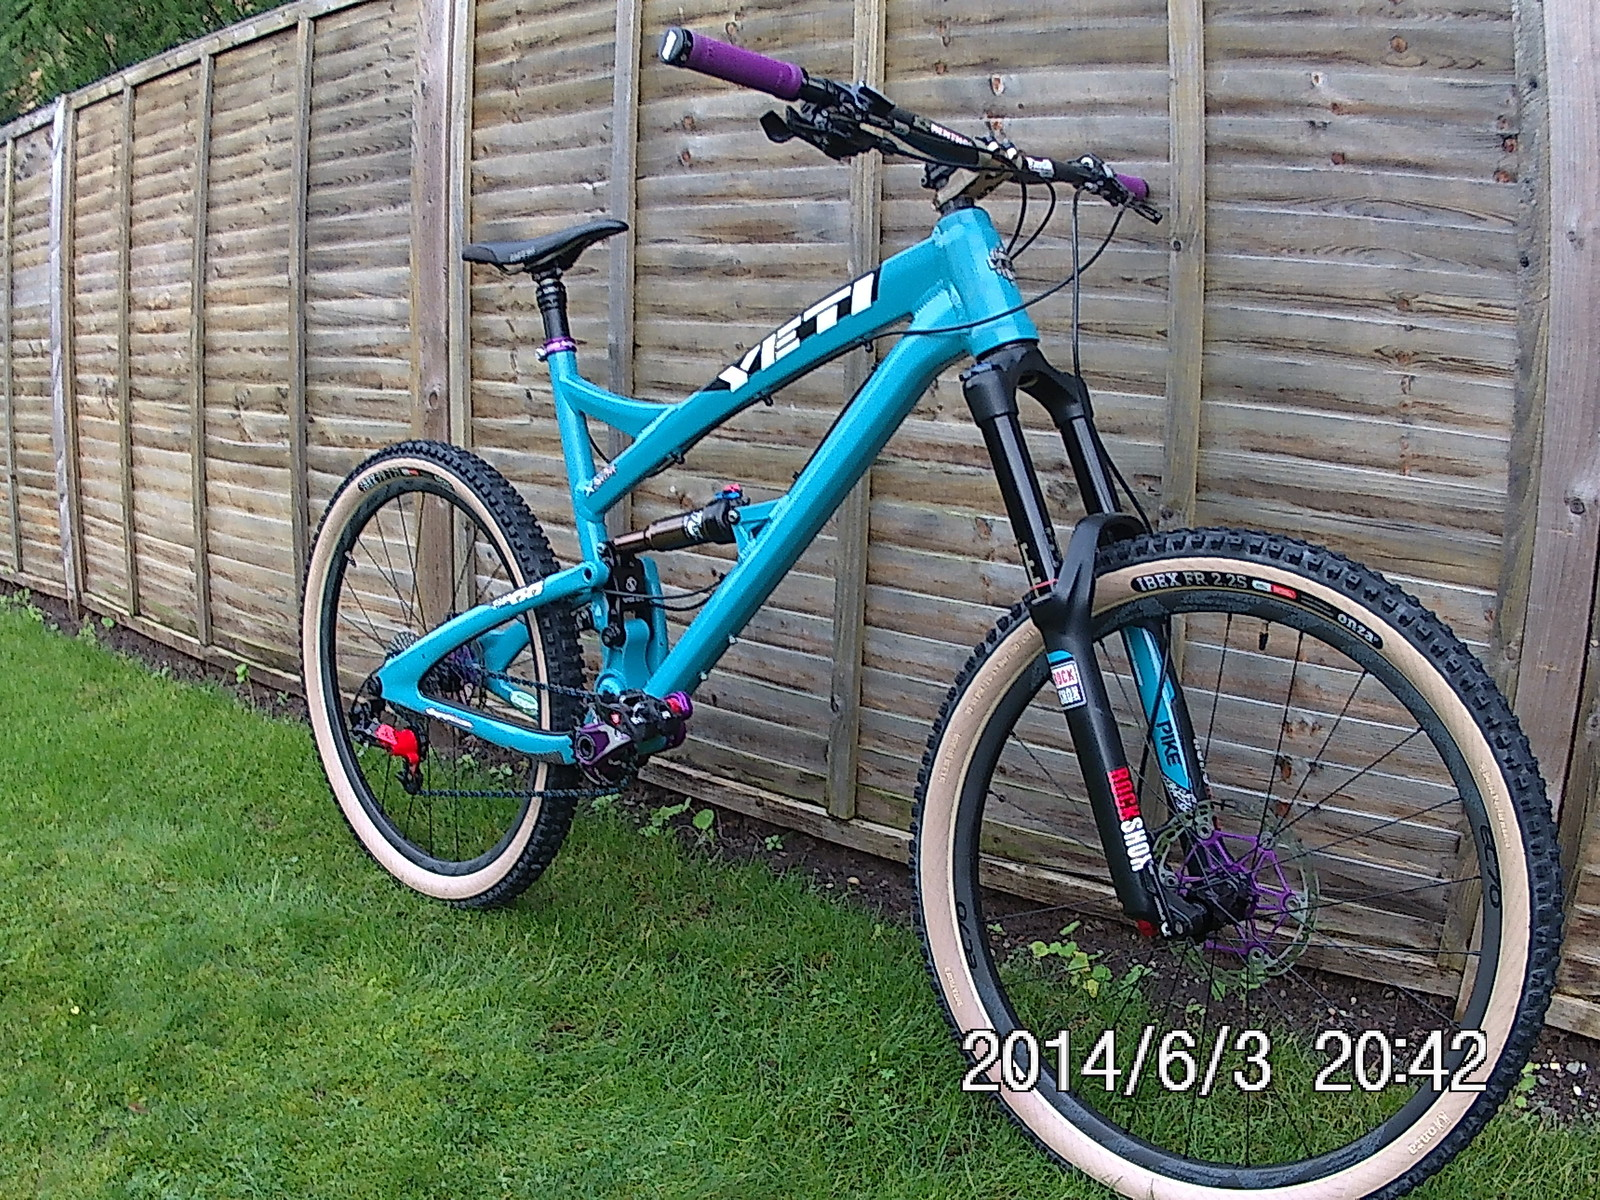 20140603 204222 - Bítel - Mountain Biking Pictures - Vital MTB